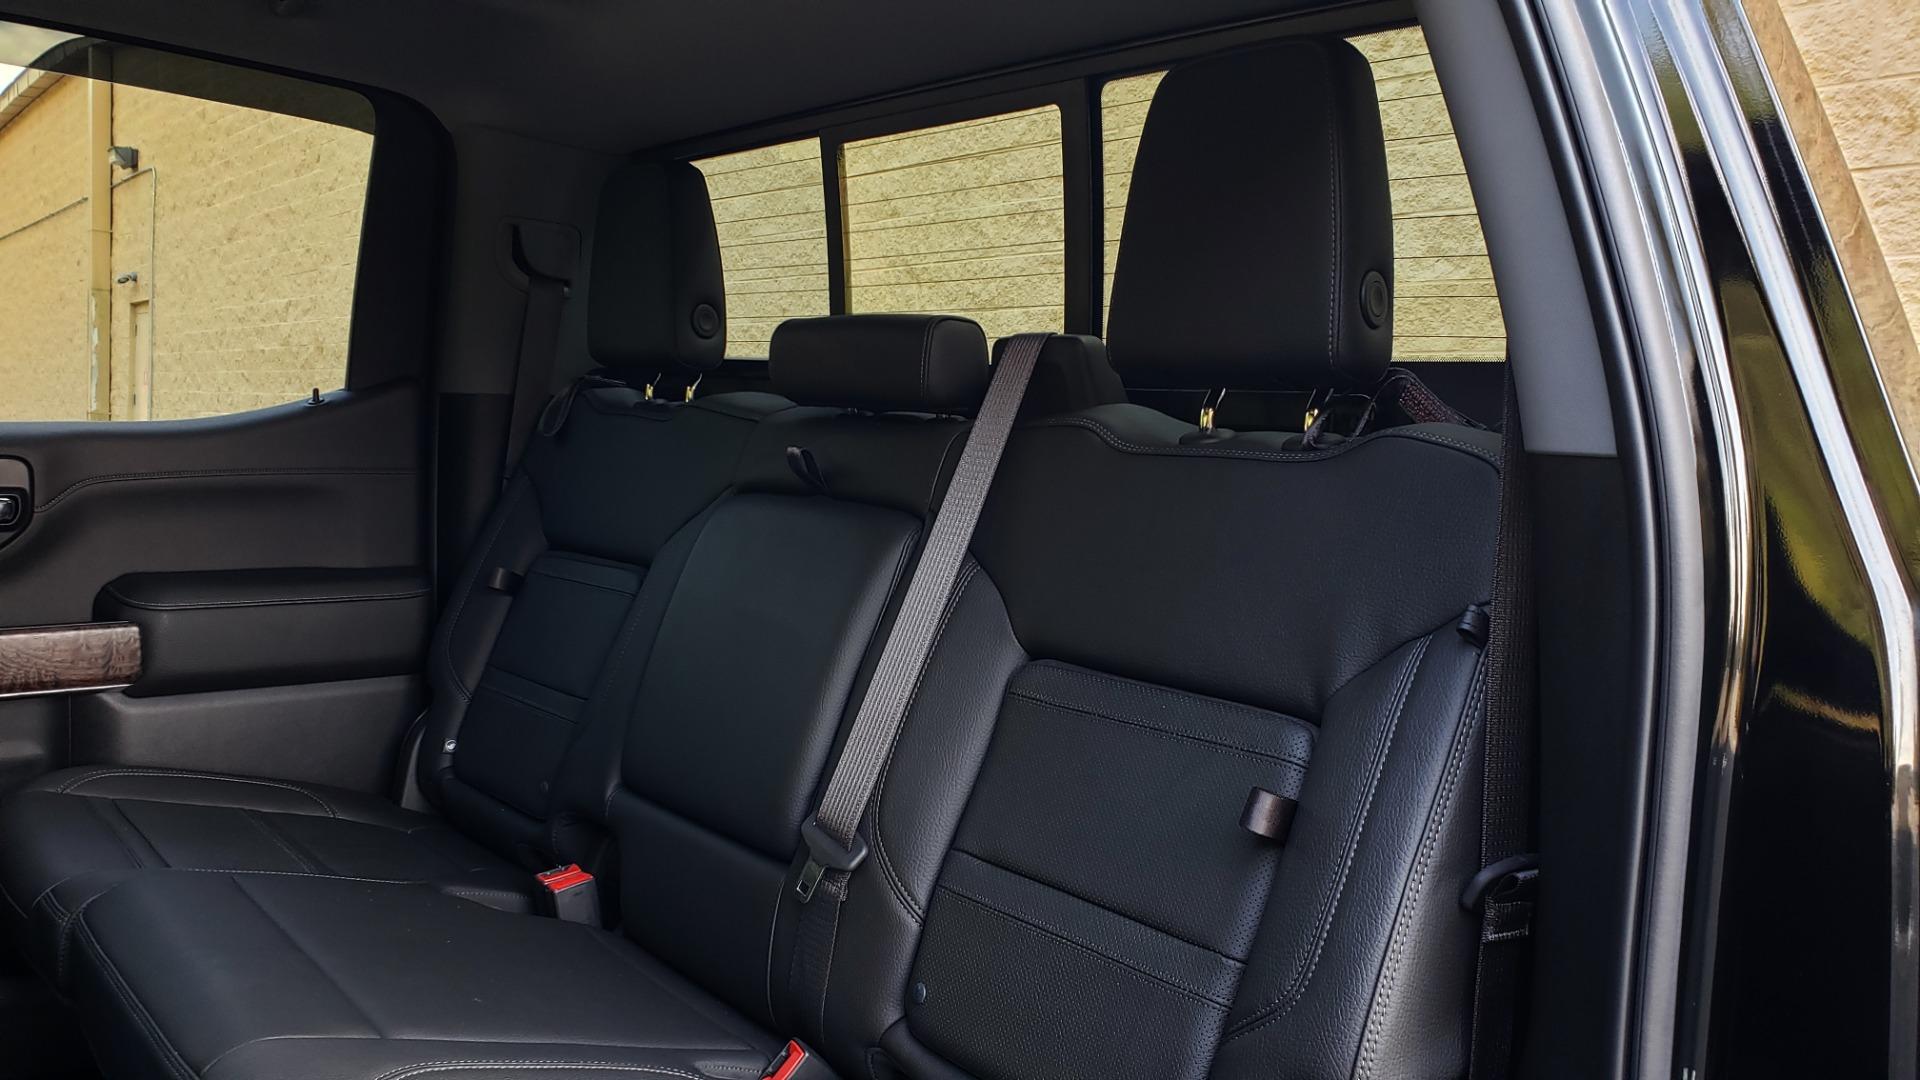 Used 2019 GMC SIERRA 1500 DENALI ULTIMATE 4WD / NAV / TECH PKG / DRVR ALRT for sale Sold at Formula Imports in Charlotte NC 28227 67